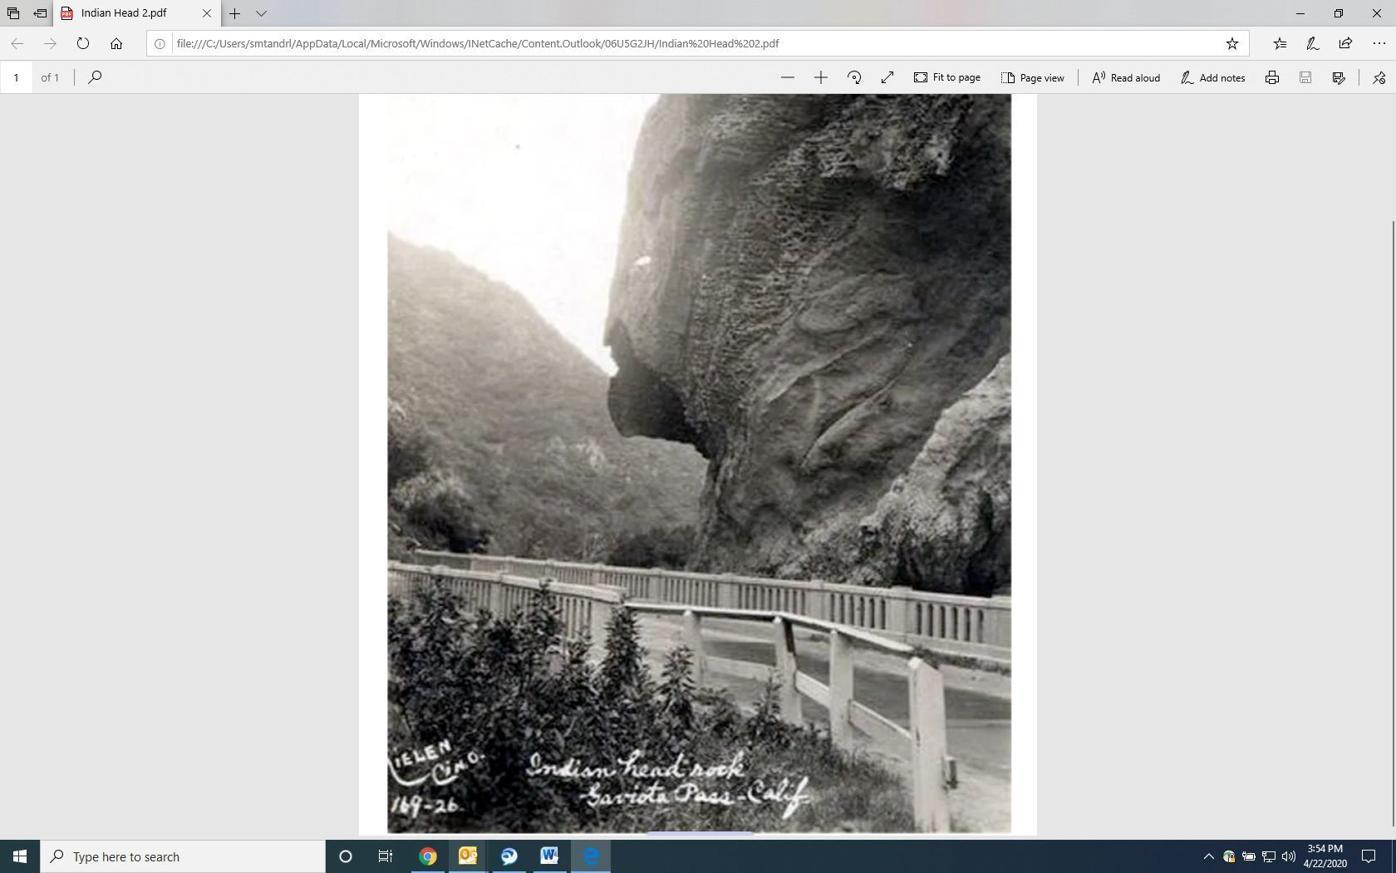 Judith Dale: History of the Gaviota Pass